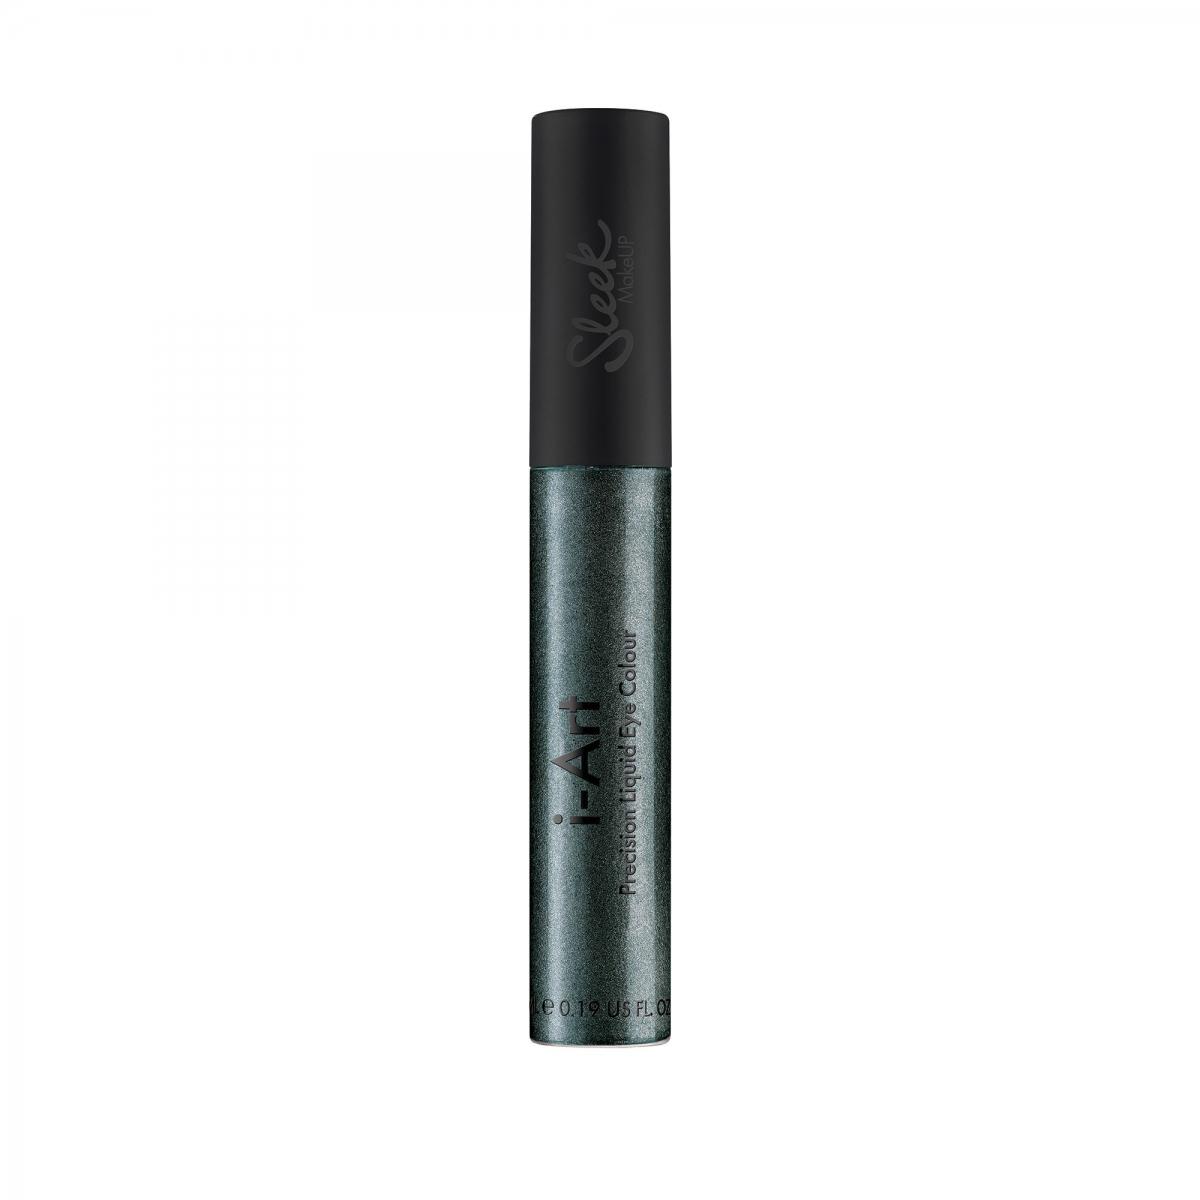 Жидкие тени для век Sleek MakeUp I-art precision liquid eye colour Impressionism 1136